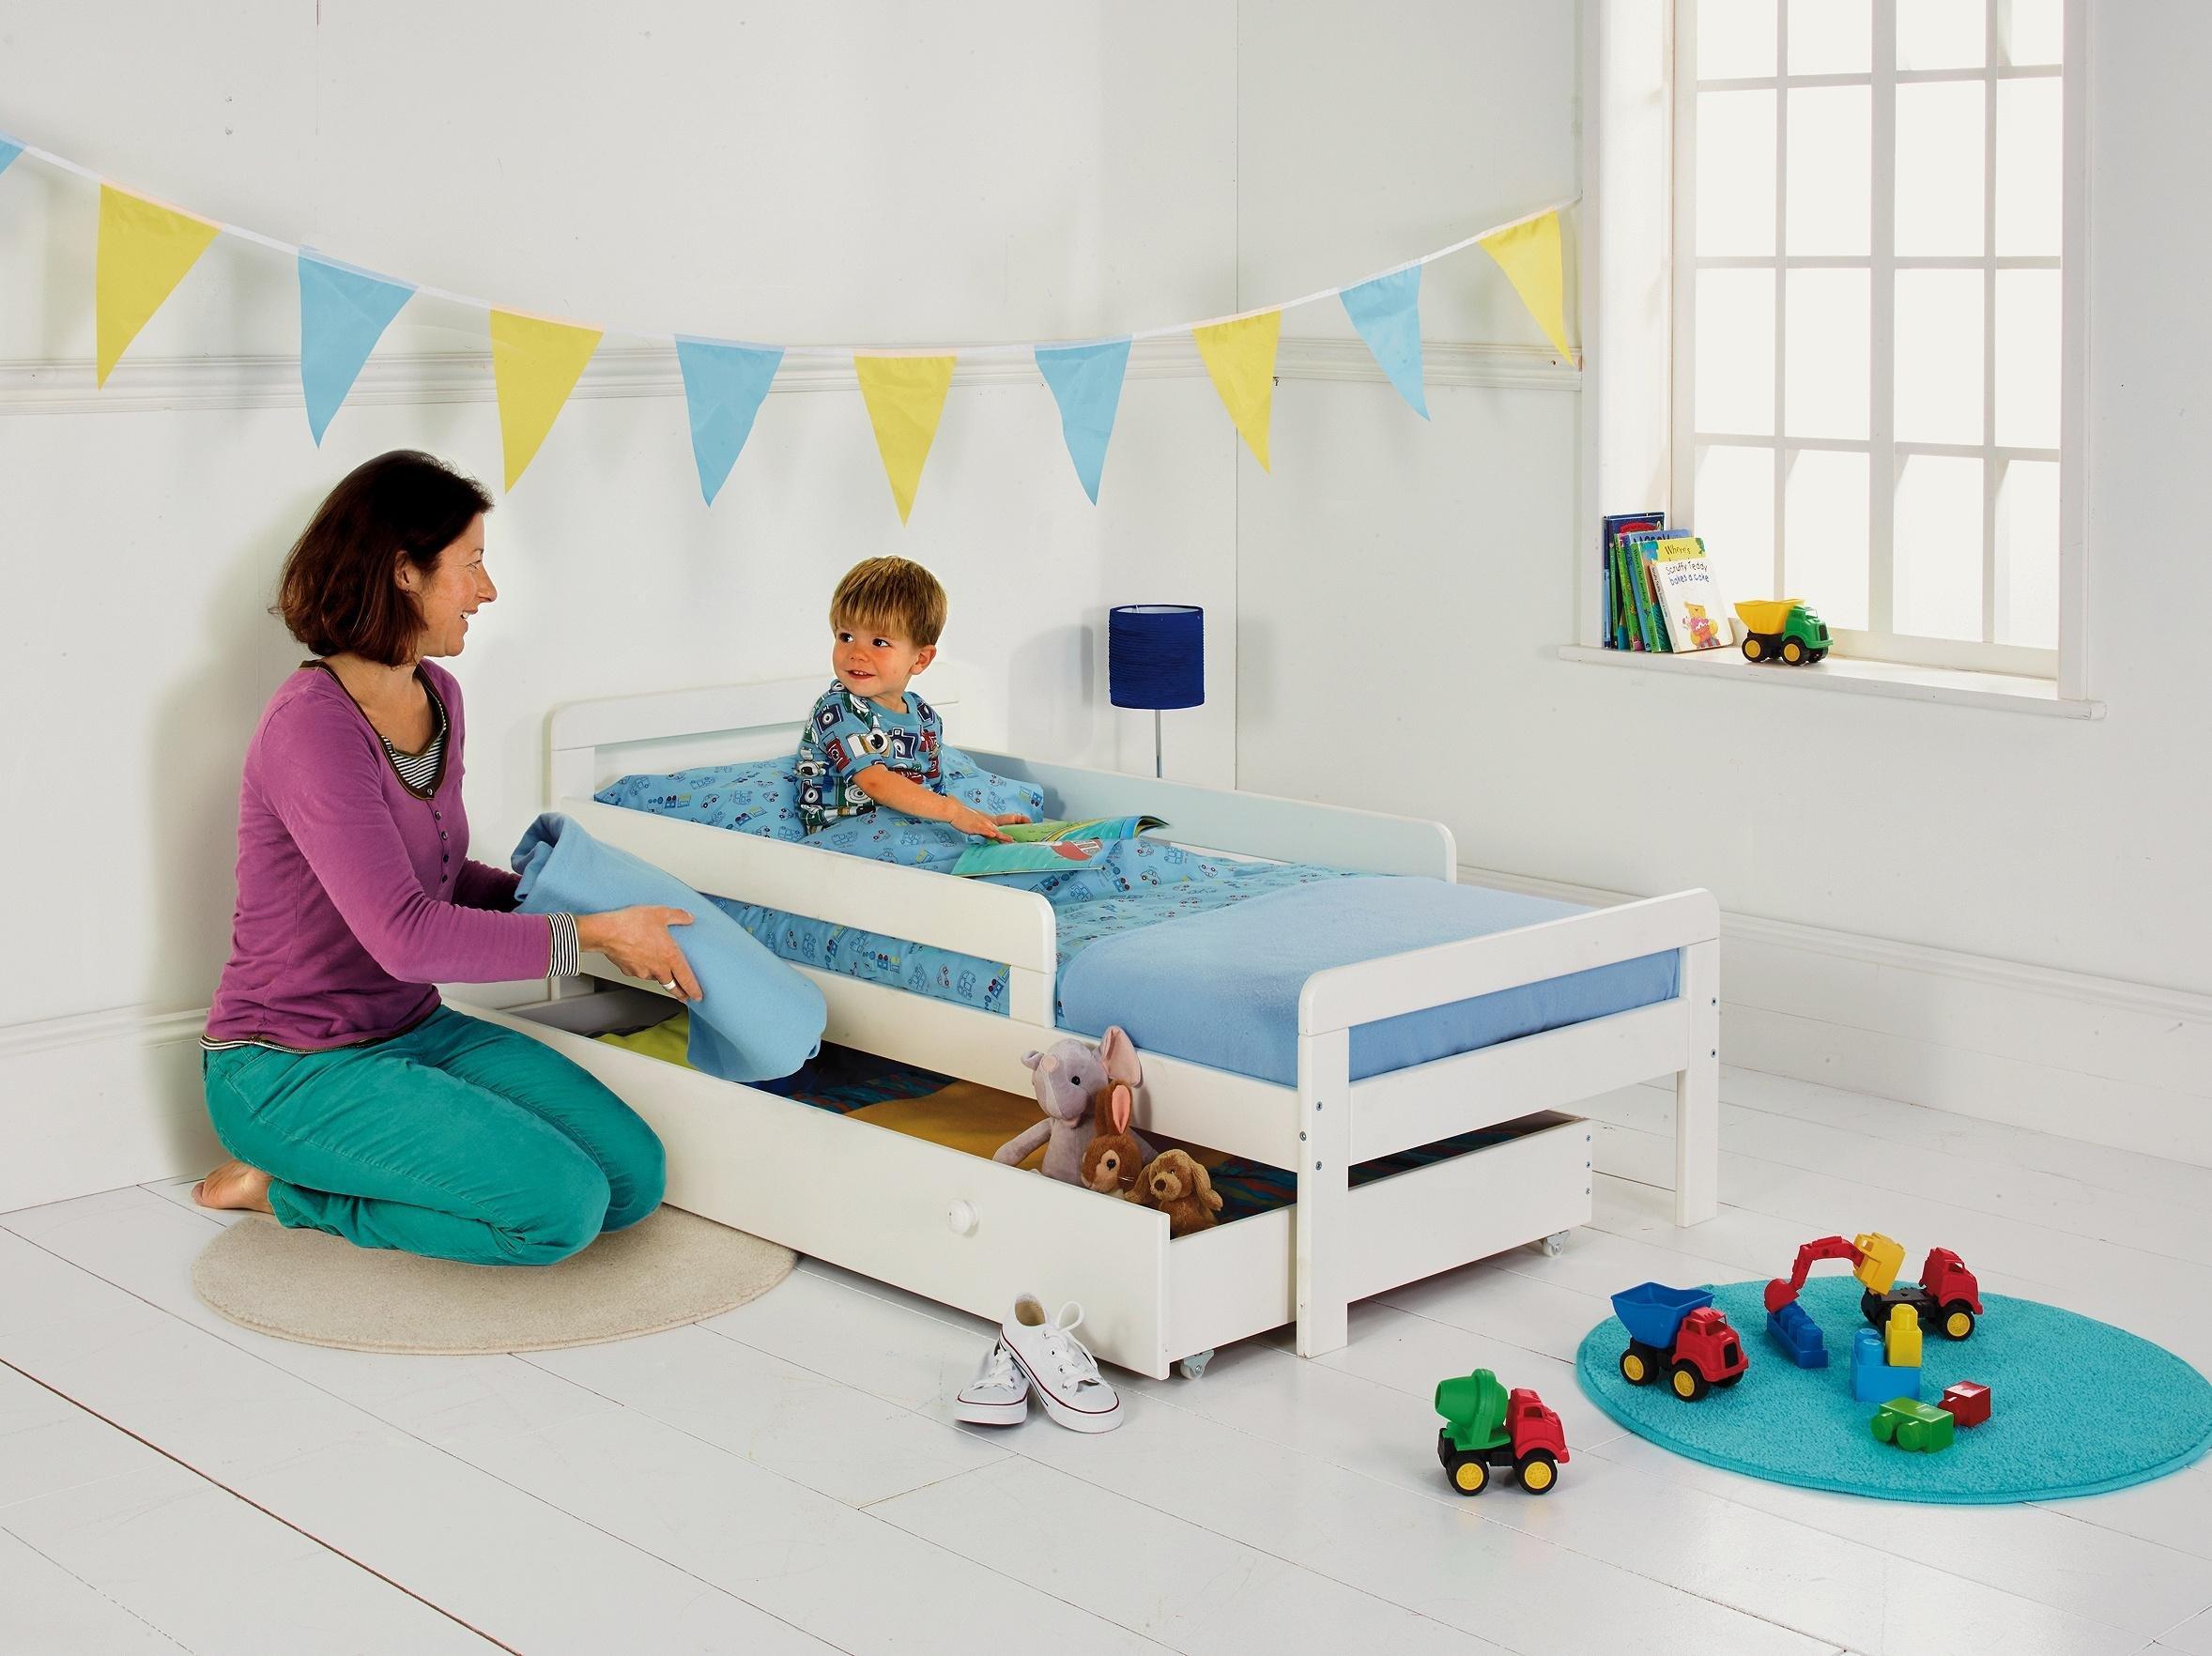 Argos Home - Ellis Toddler Bed Frame with Drawer - White